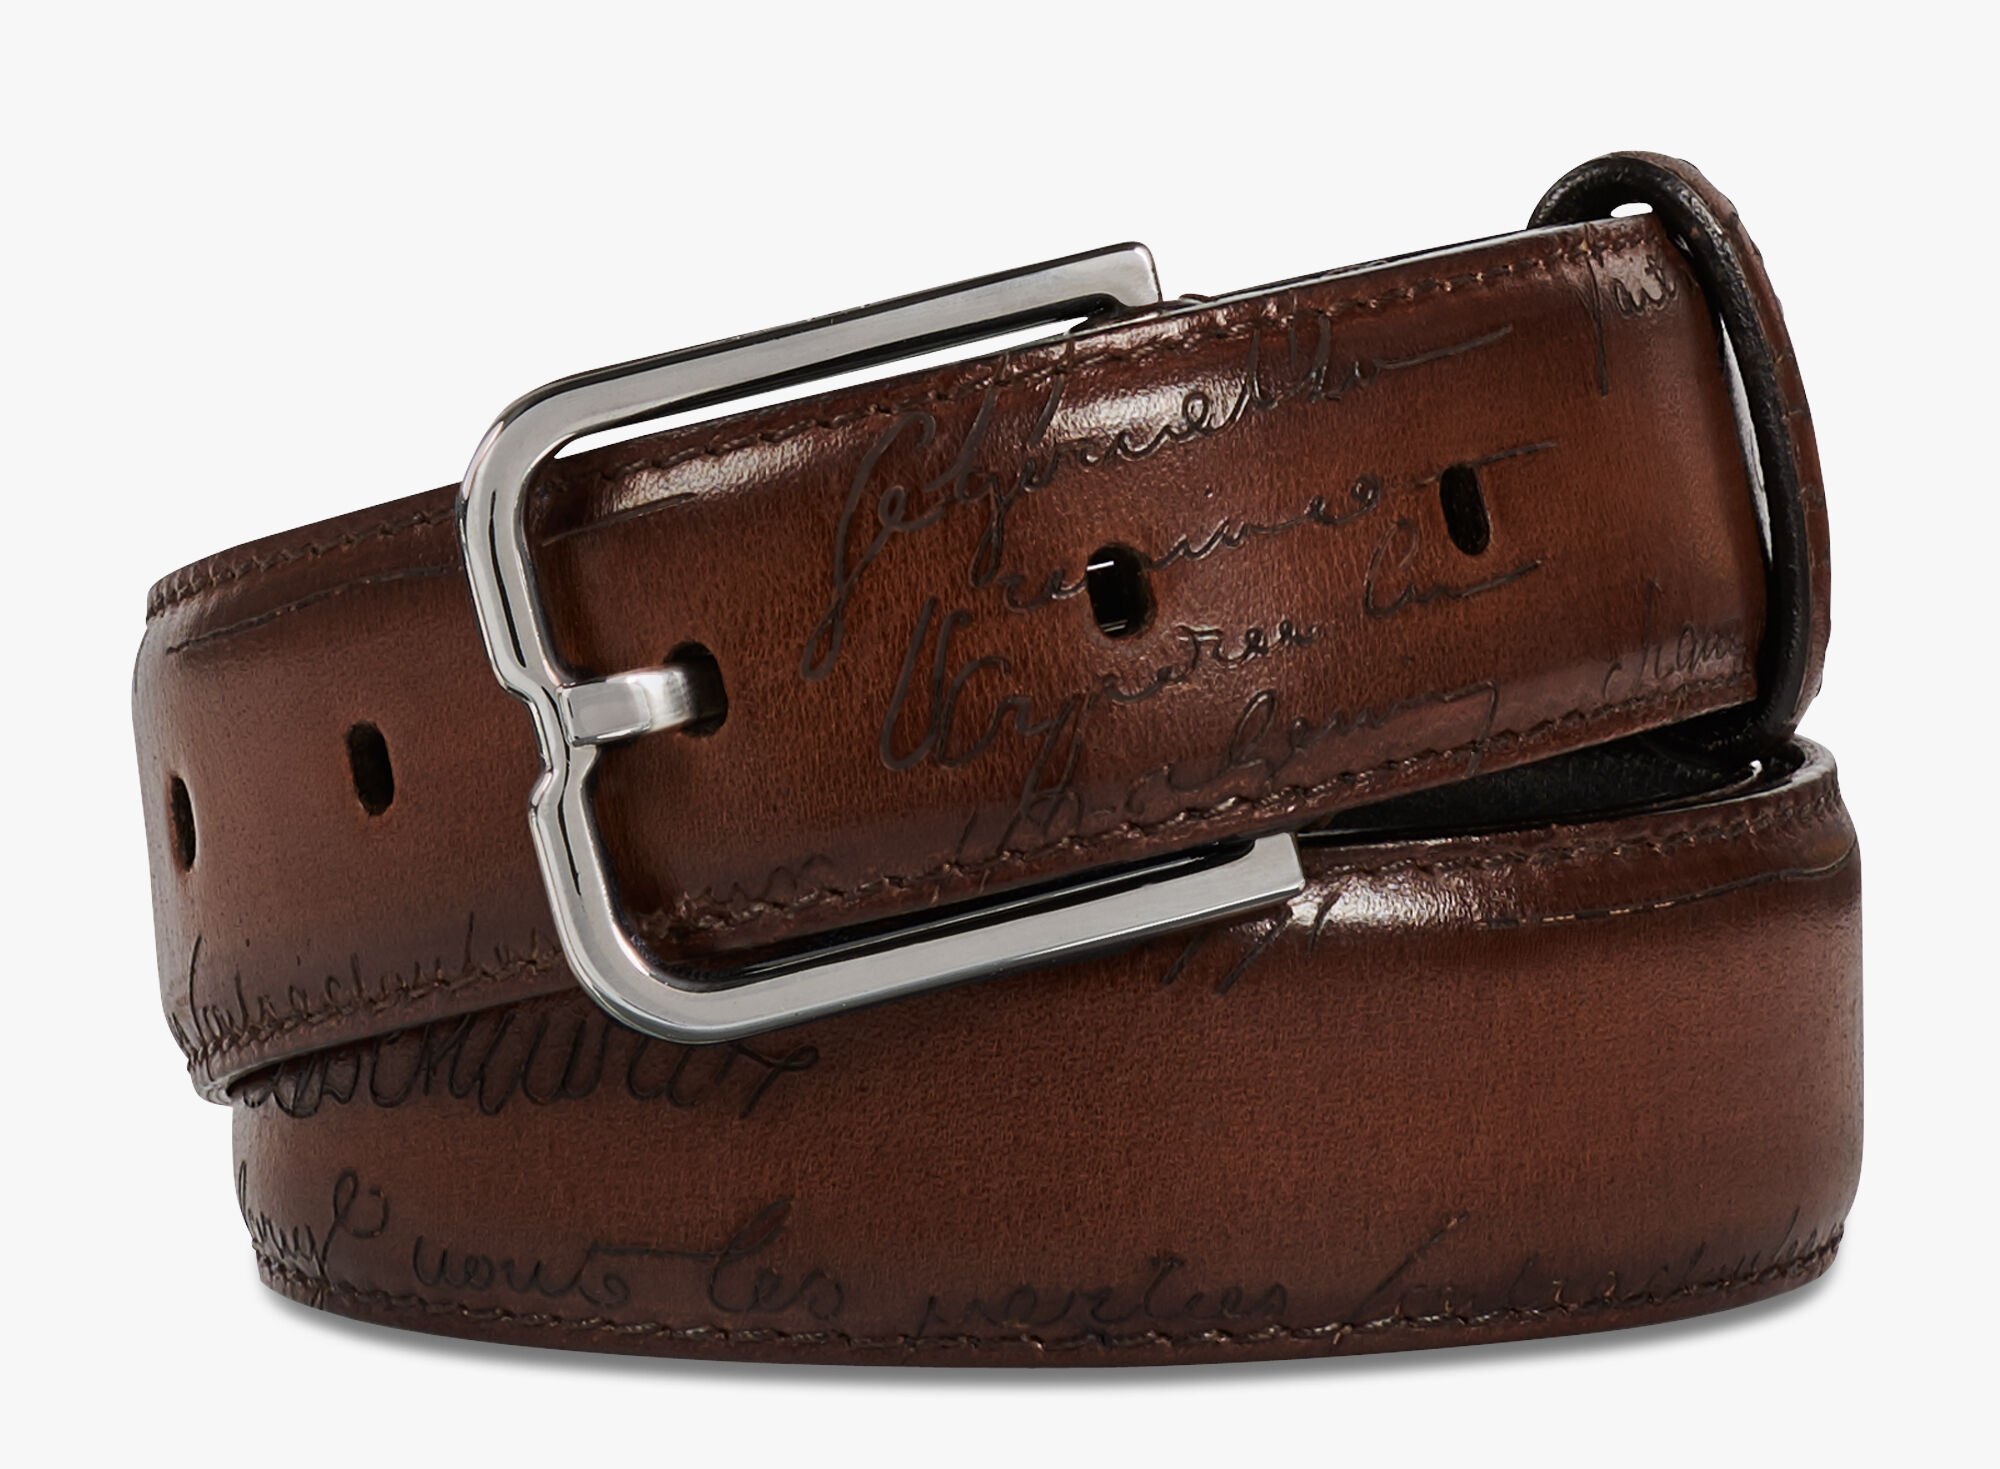 Essence Full Engraved Venezia Calf Leather Belt - 32 mm, MOGANO, hi-res